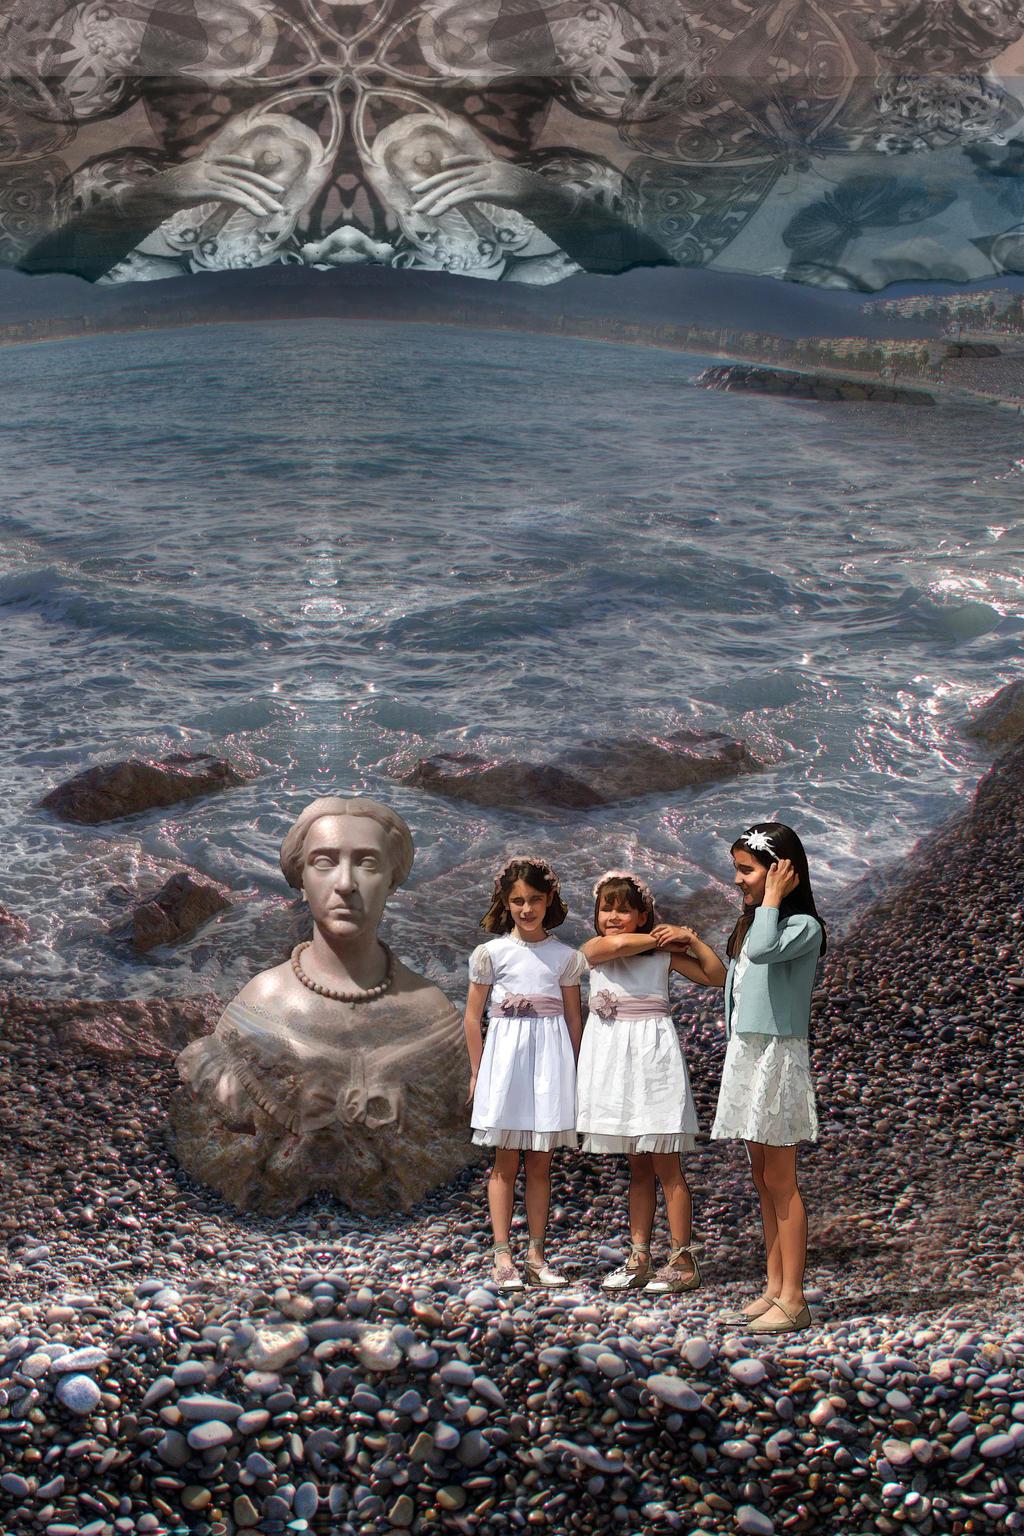 Snapshots from Atlantis by taisteng